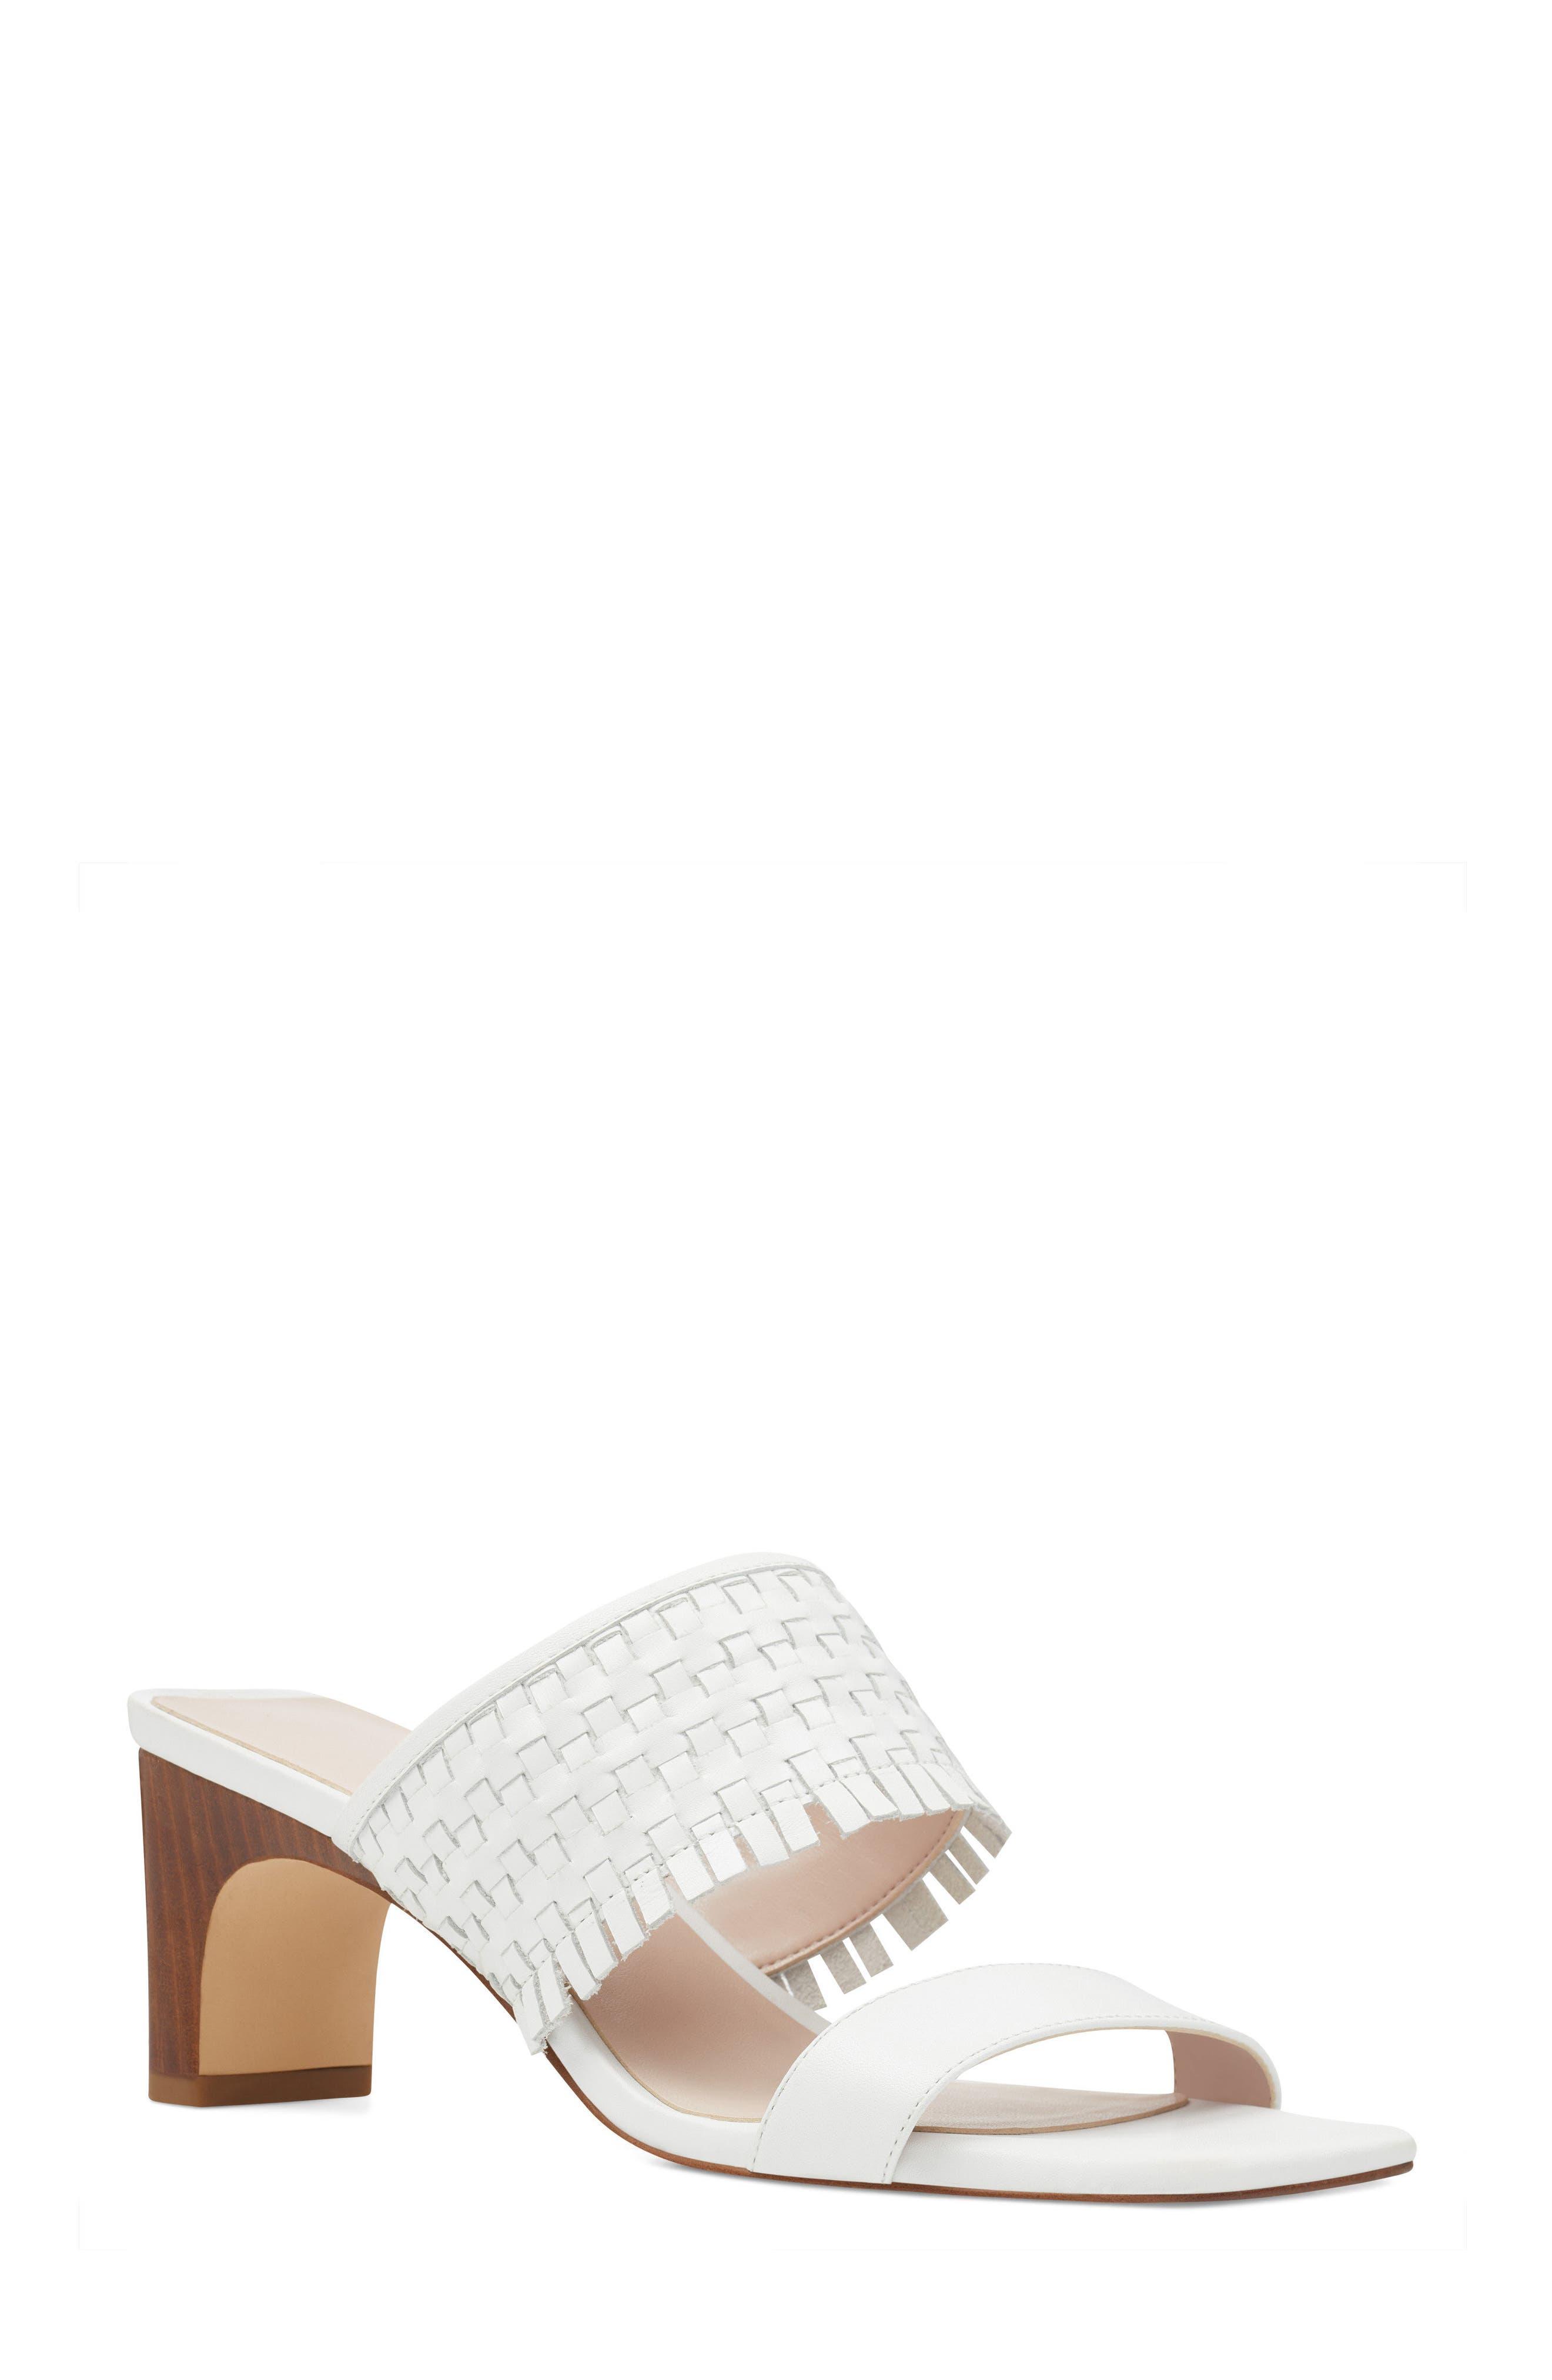 Nirveli Woven Slide Sandal by Nine West